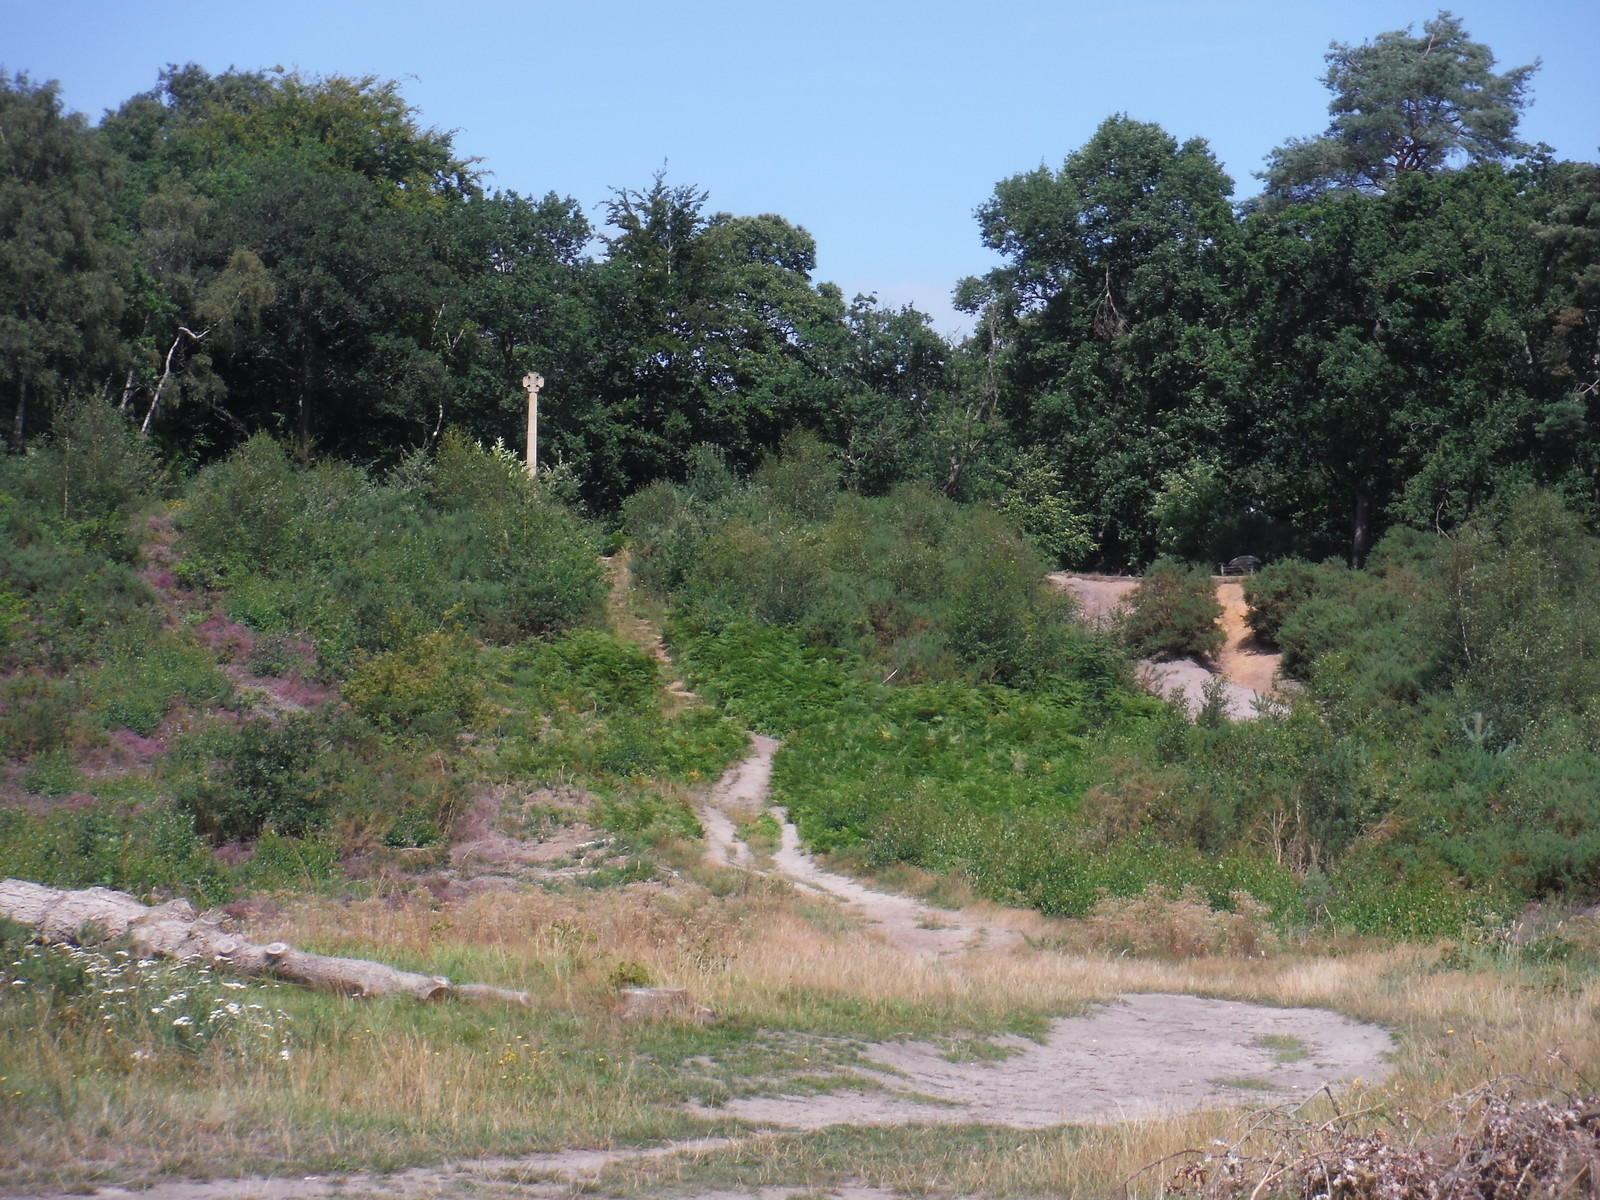 War Memorial on South Slope, Oxshott Heath SWC Short Walk 17 - Oxshott Heath, Esher and West End Commons